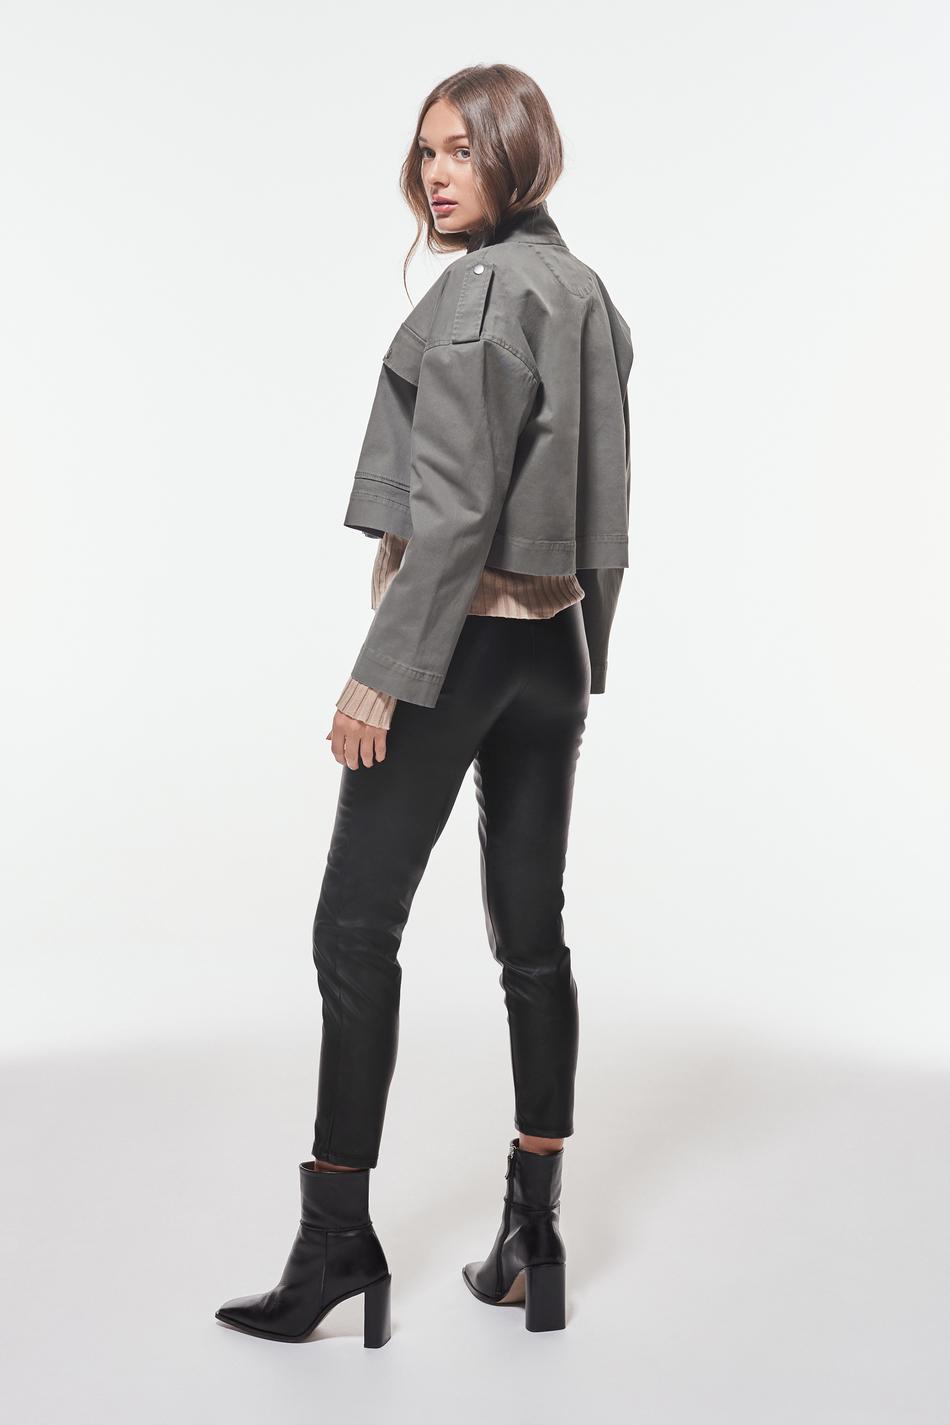 Maj pu trousers 249.00 DKK, Leggings Beklædning og mode